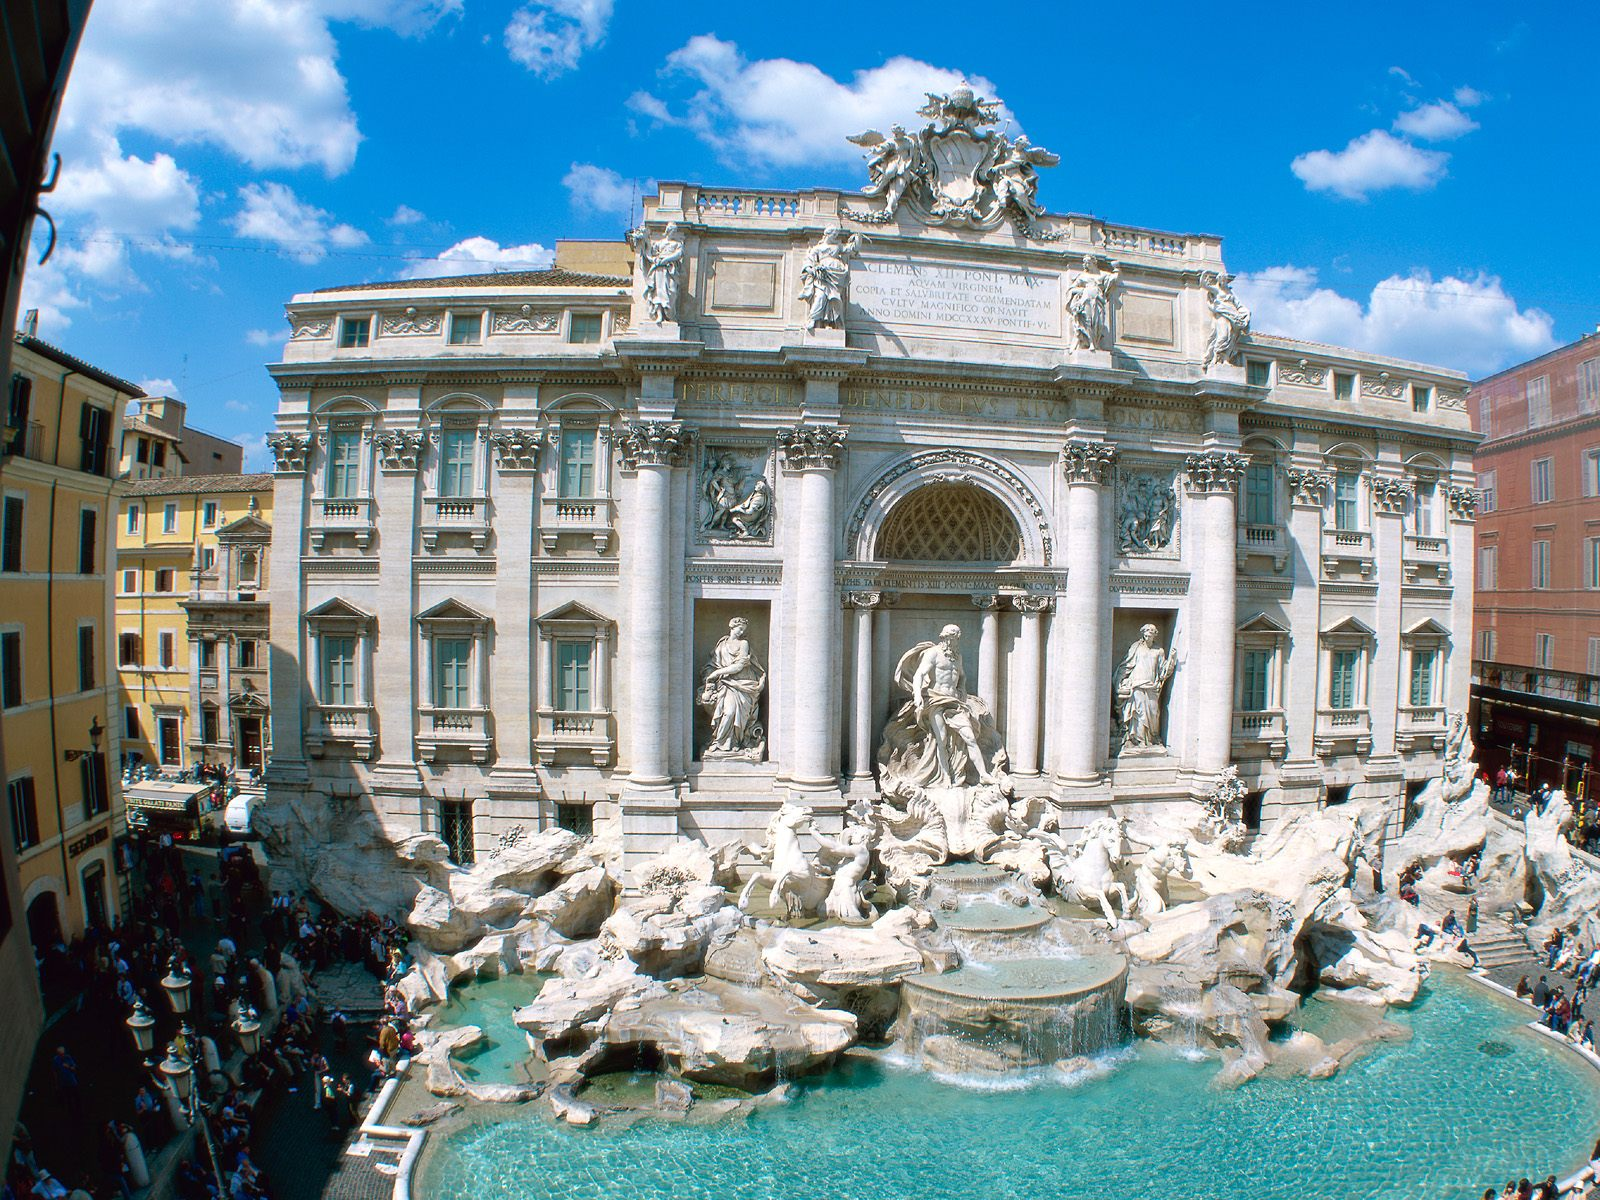 http://2.bp.blogspot.com/-LuTFa8w0EgI/TwKbVzyLoAI/AAAAAAAAA8A/VJpAeUMTVJI/s1600/Italy-Beauty+of+the+World-Wallpaper-Trevi+Fountain%252C+Rome%252C+Italy.jpg